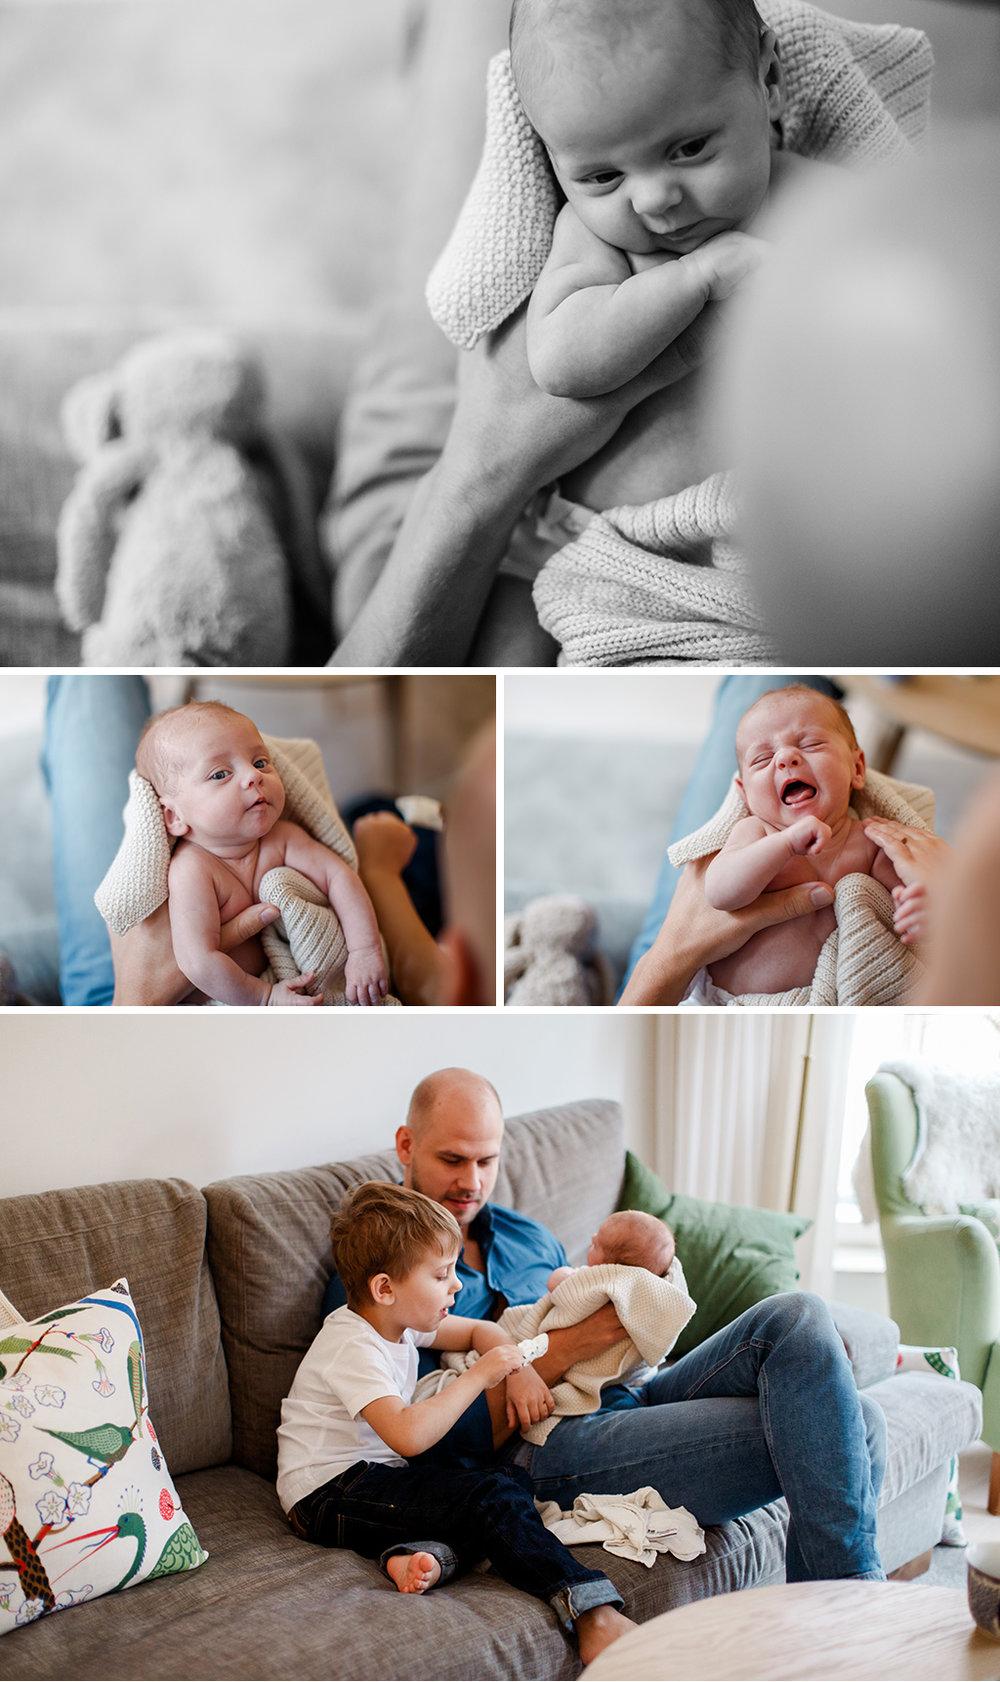 Lifestyle-nyfoddfotografering_newbornphotography_familjefotograf_Stockholm_15.jpg